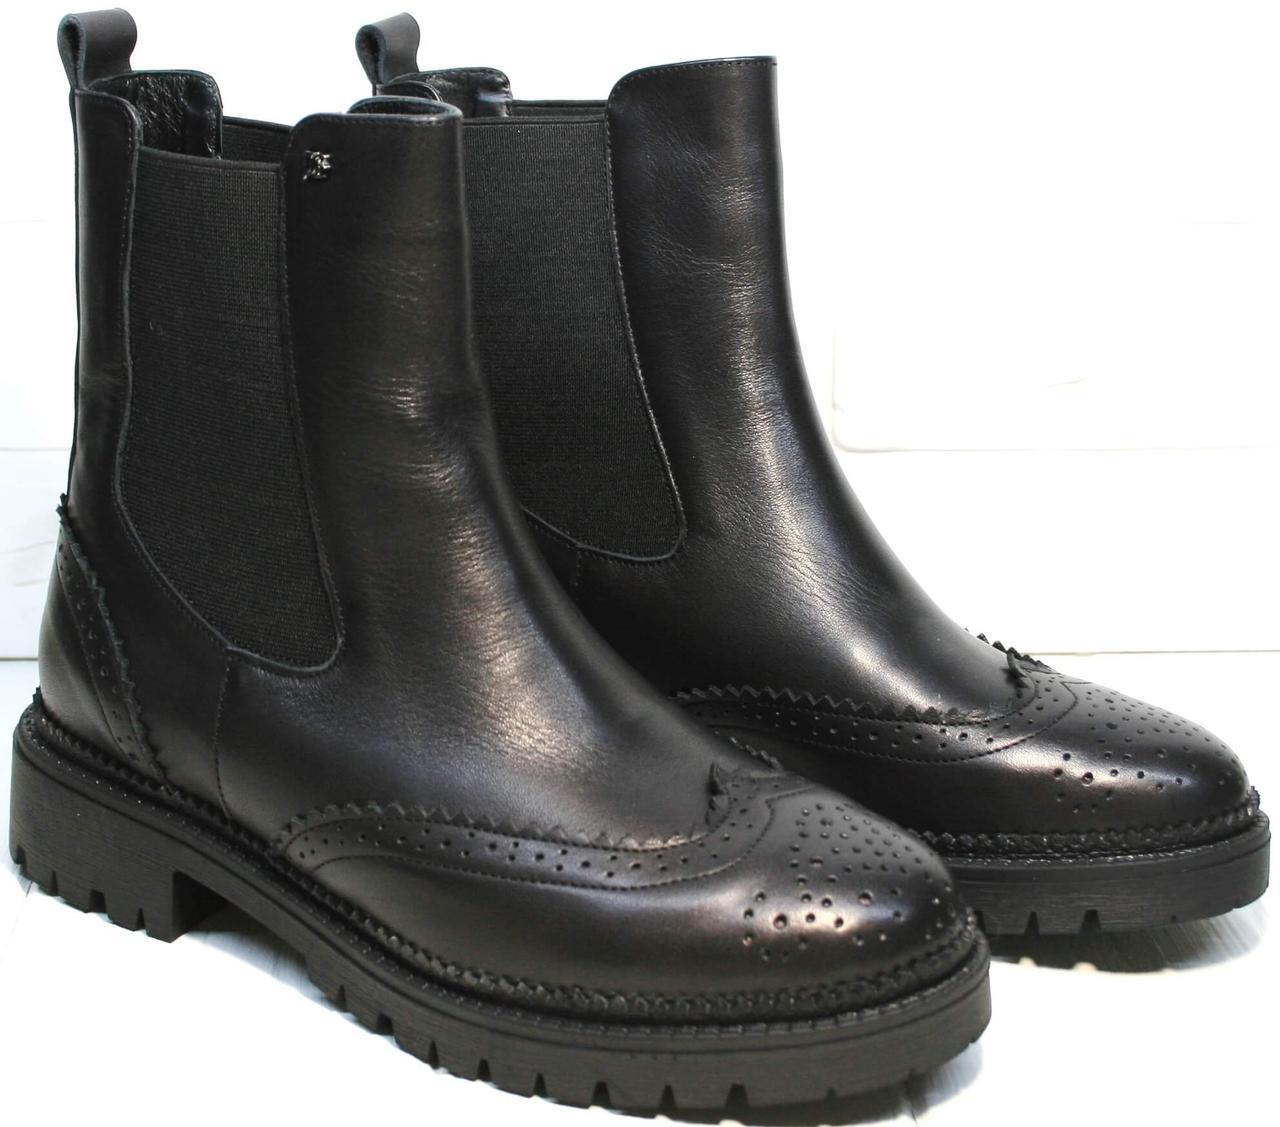 Кожаные ботинки челси женские. Высокие ботинки женские на низком каблуке Jina